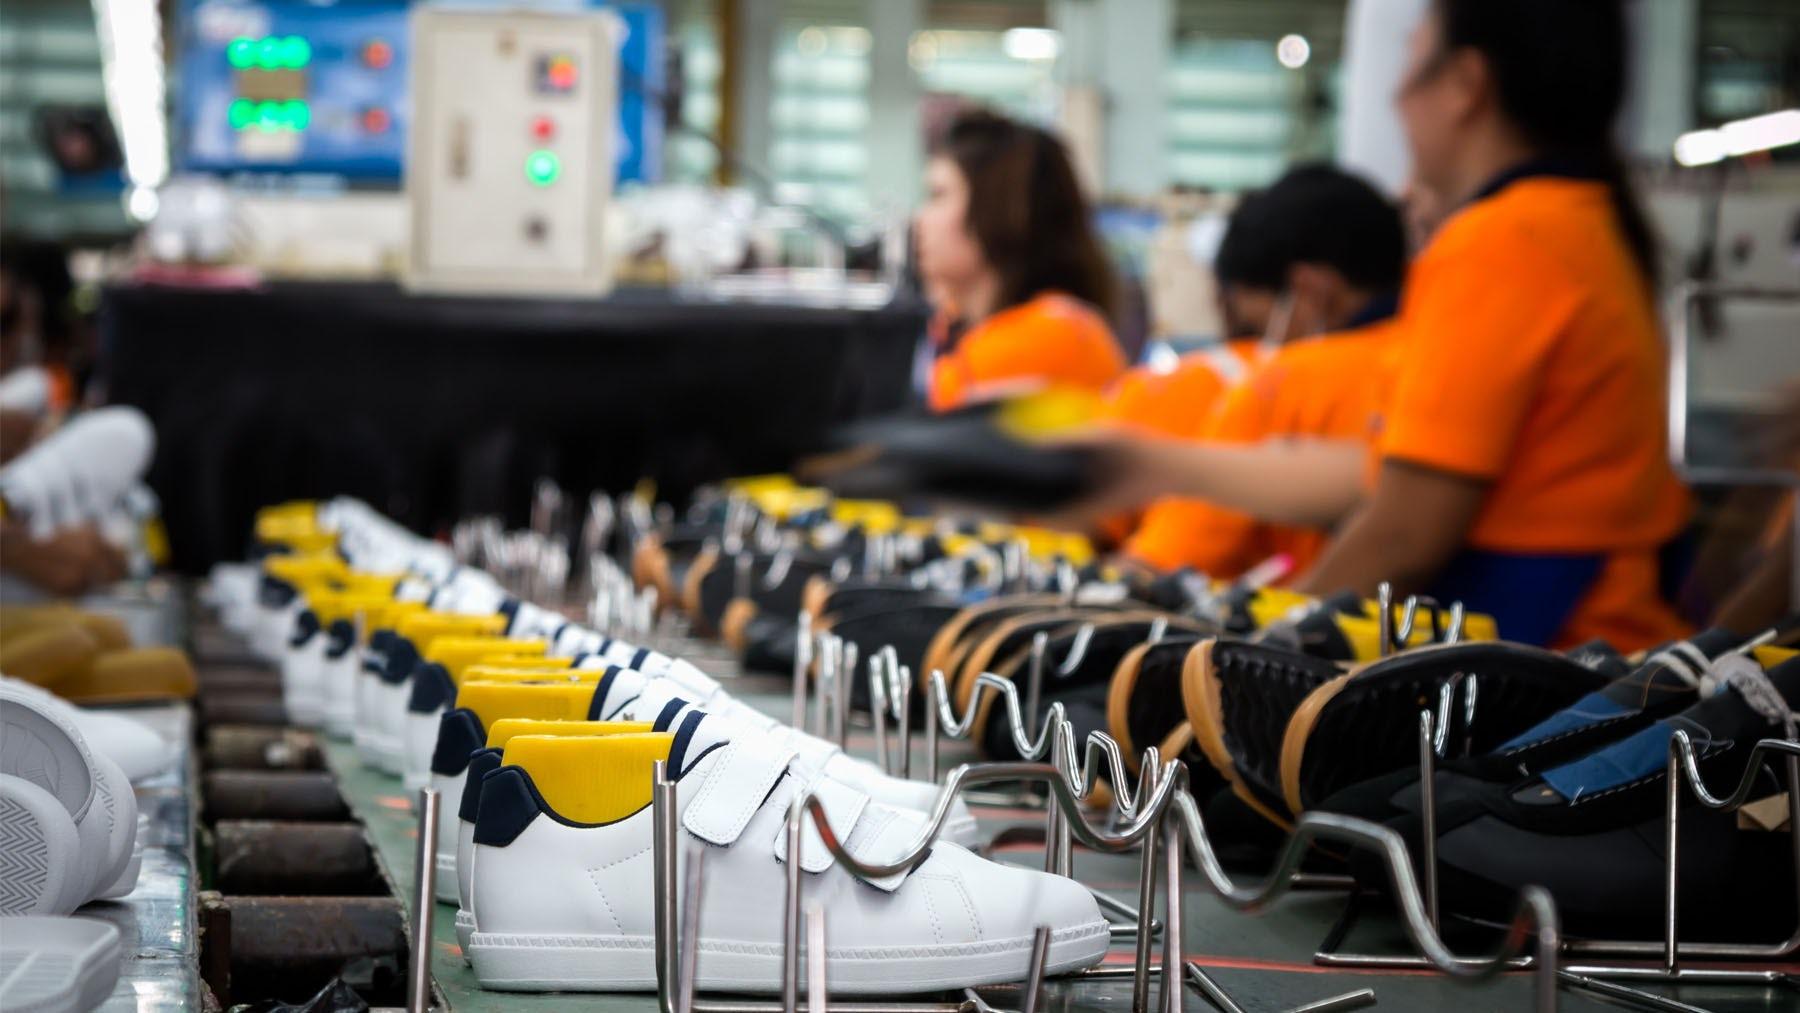 A sneaker factory | Source: Shutterstock